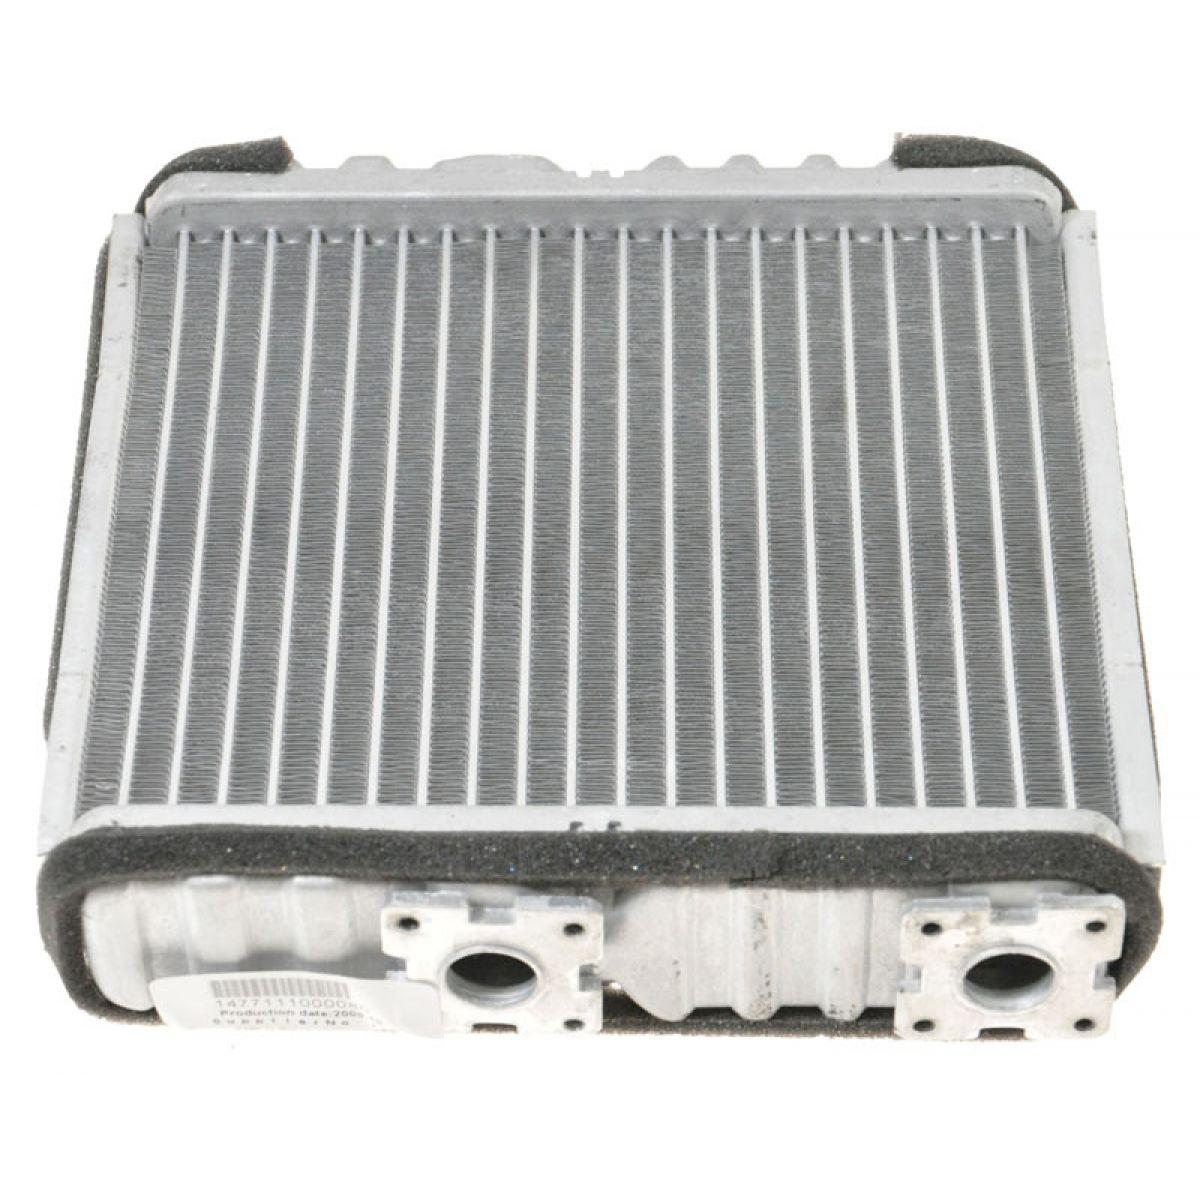 Heater Core For CL TL G20 Q45 Villager Sentra Maxima